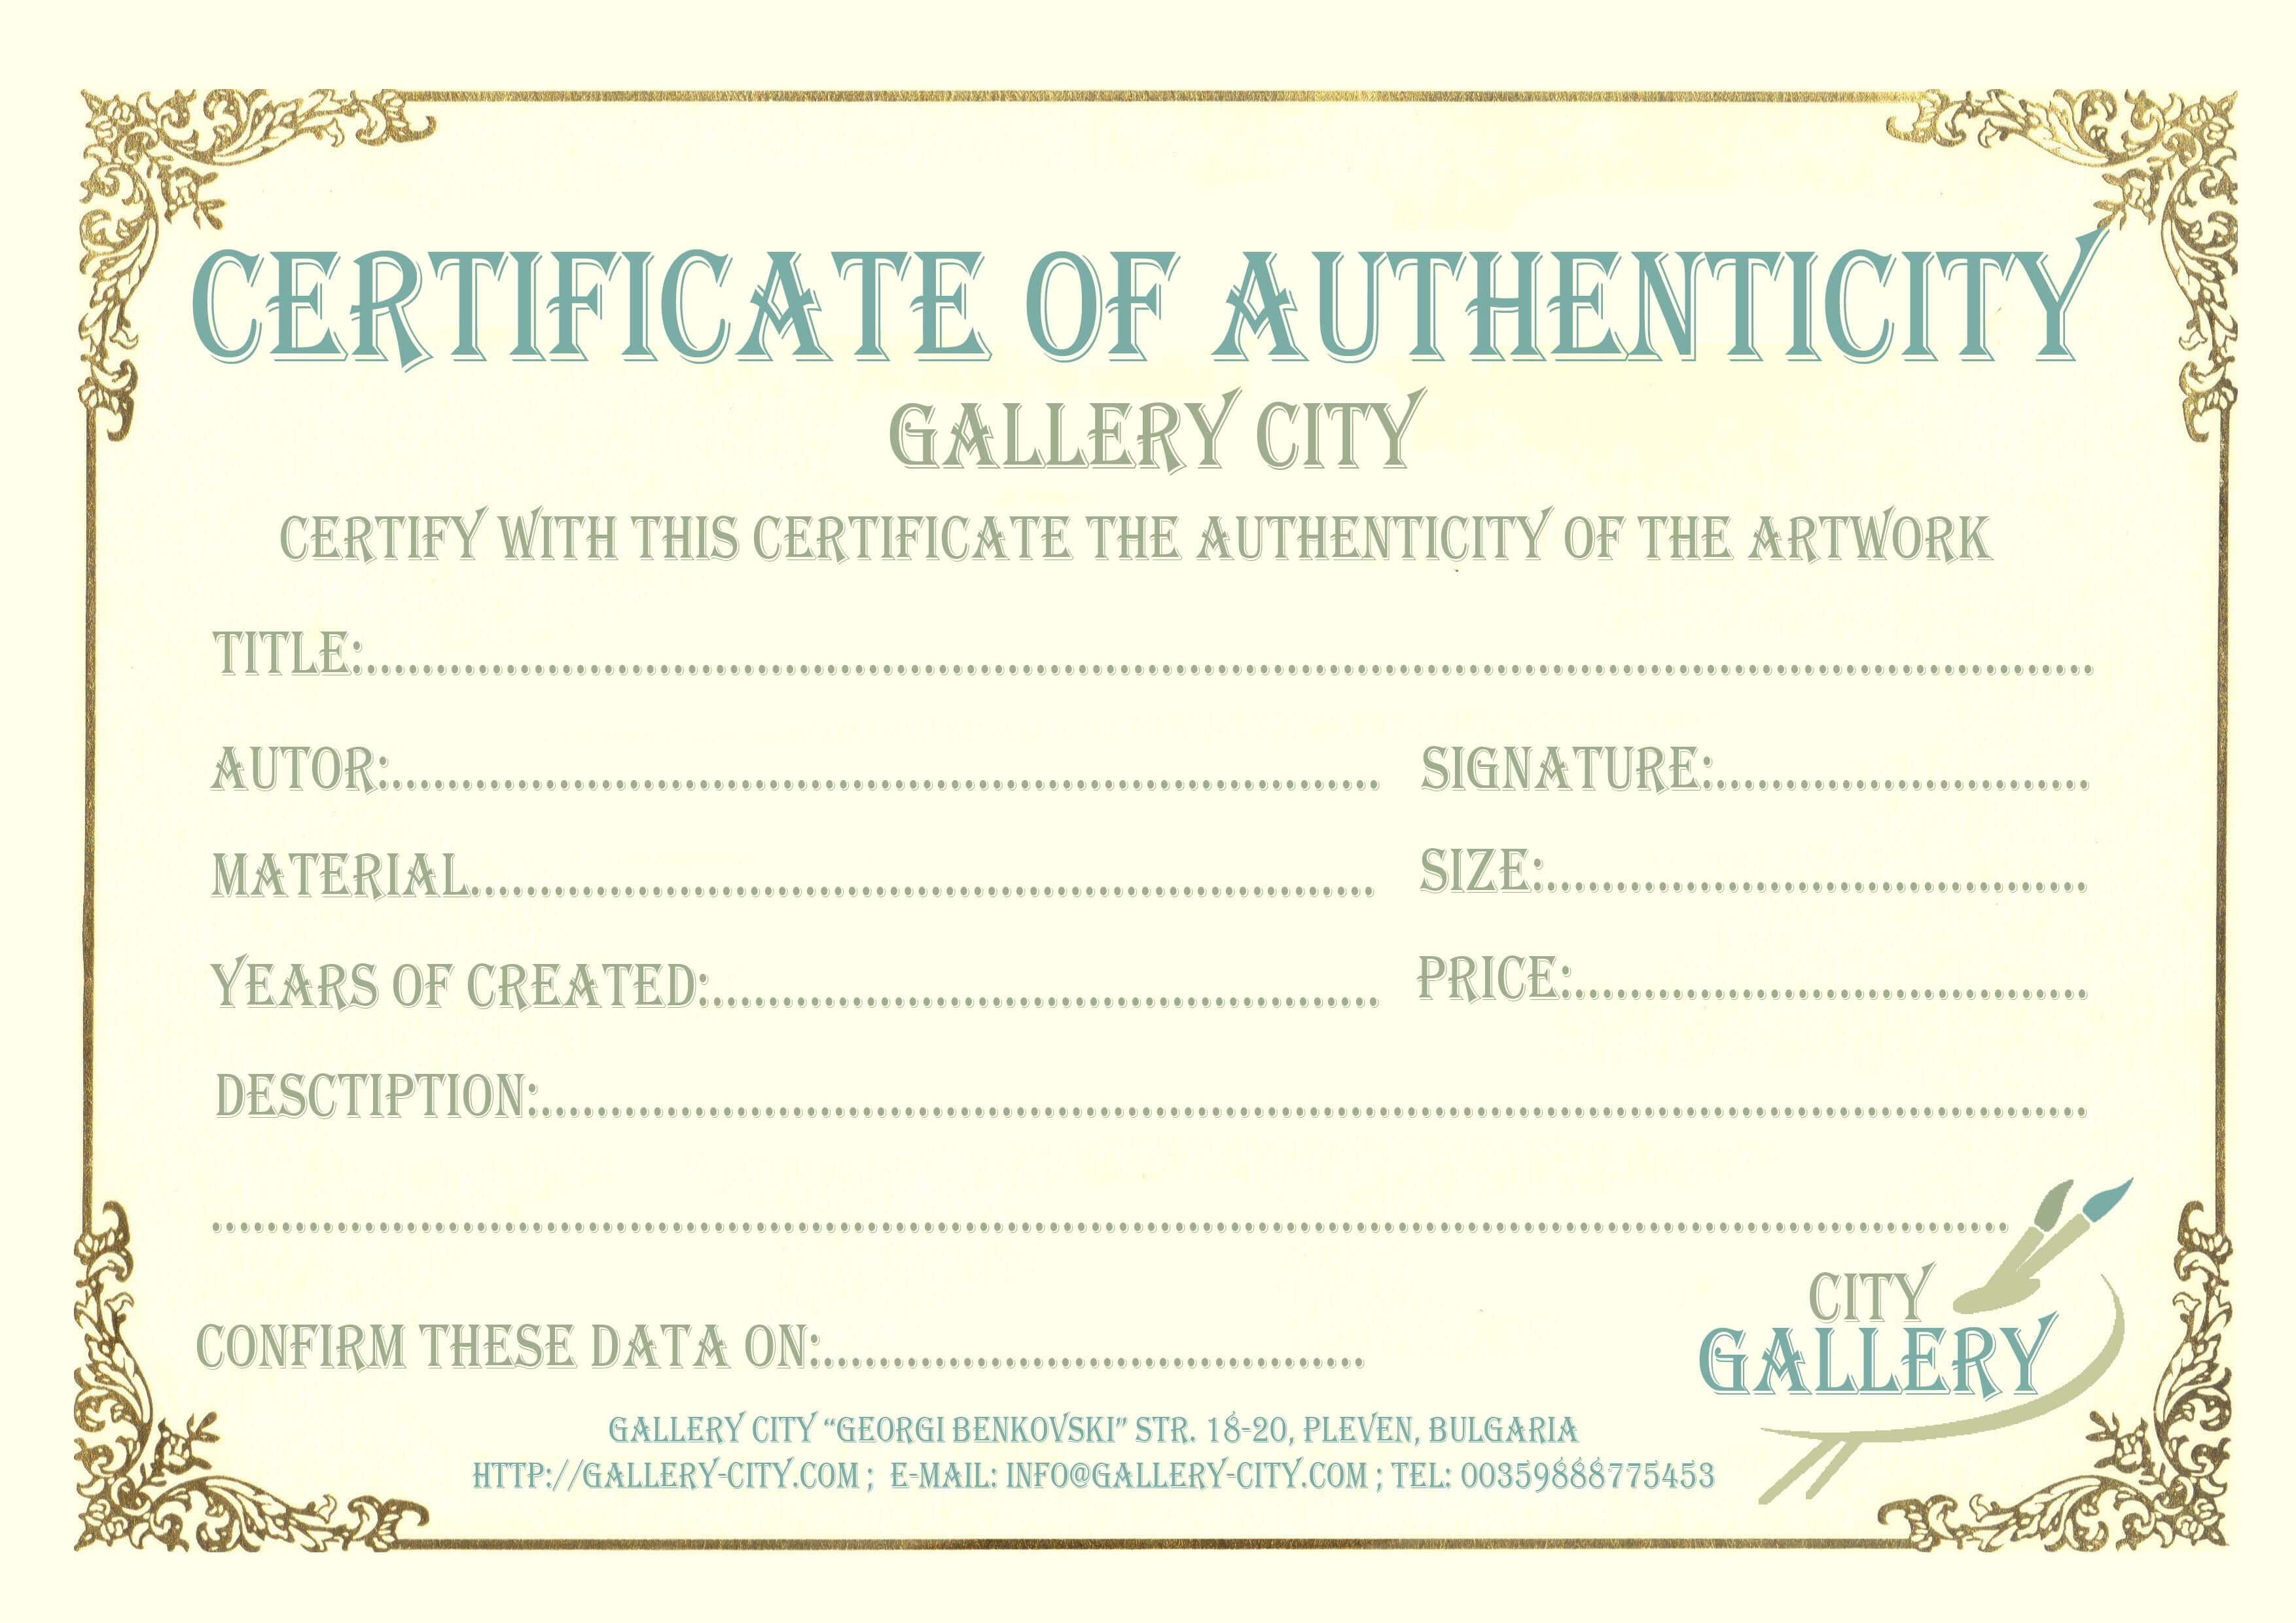 Certificate Authenticity Template Art Authenticity With Certificate Of Authenticity Template